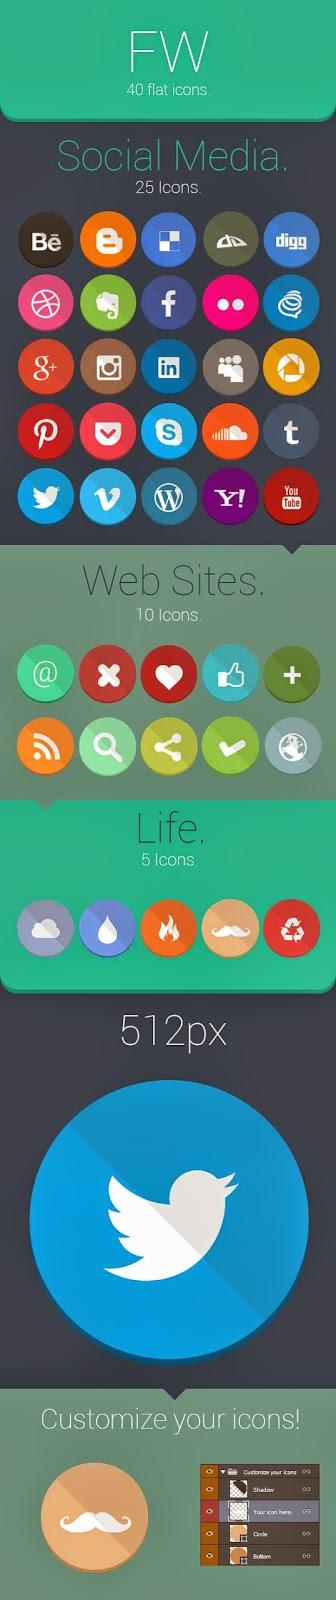 40 Flat Social Media Icons